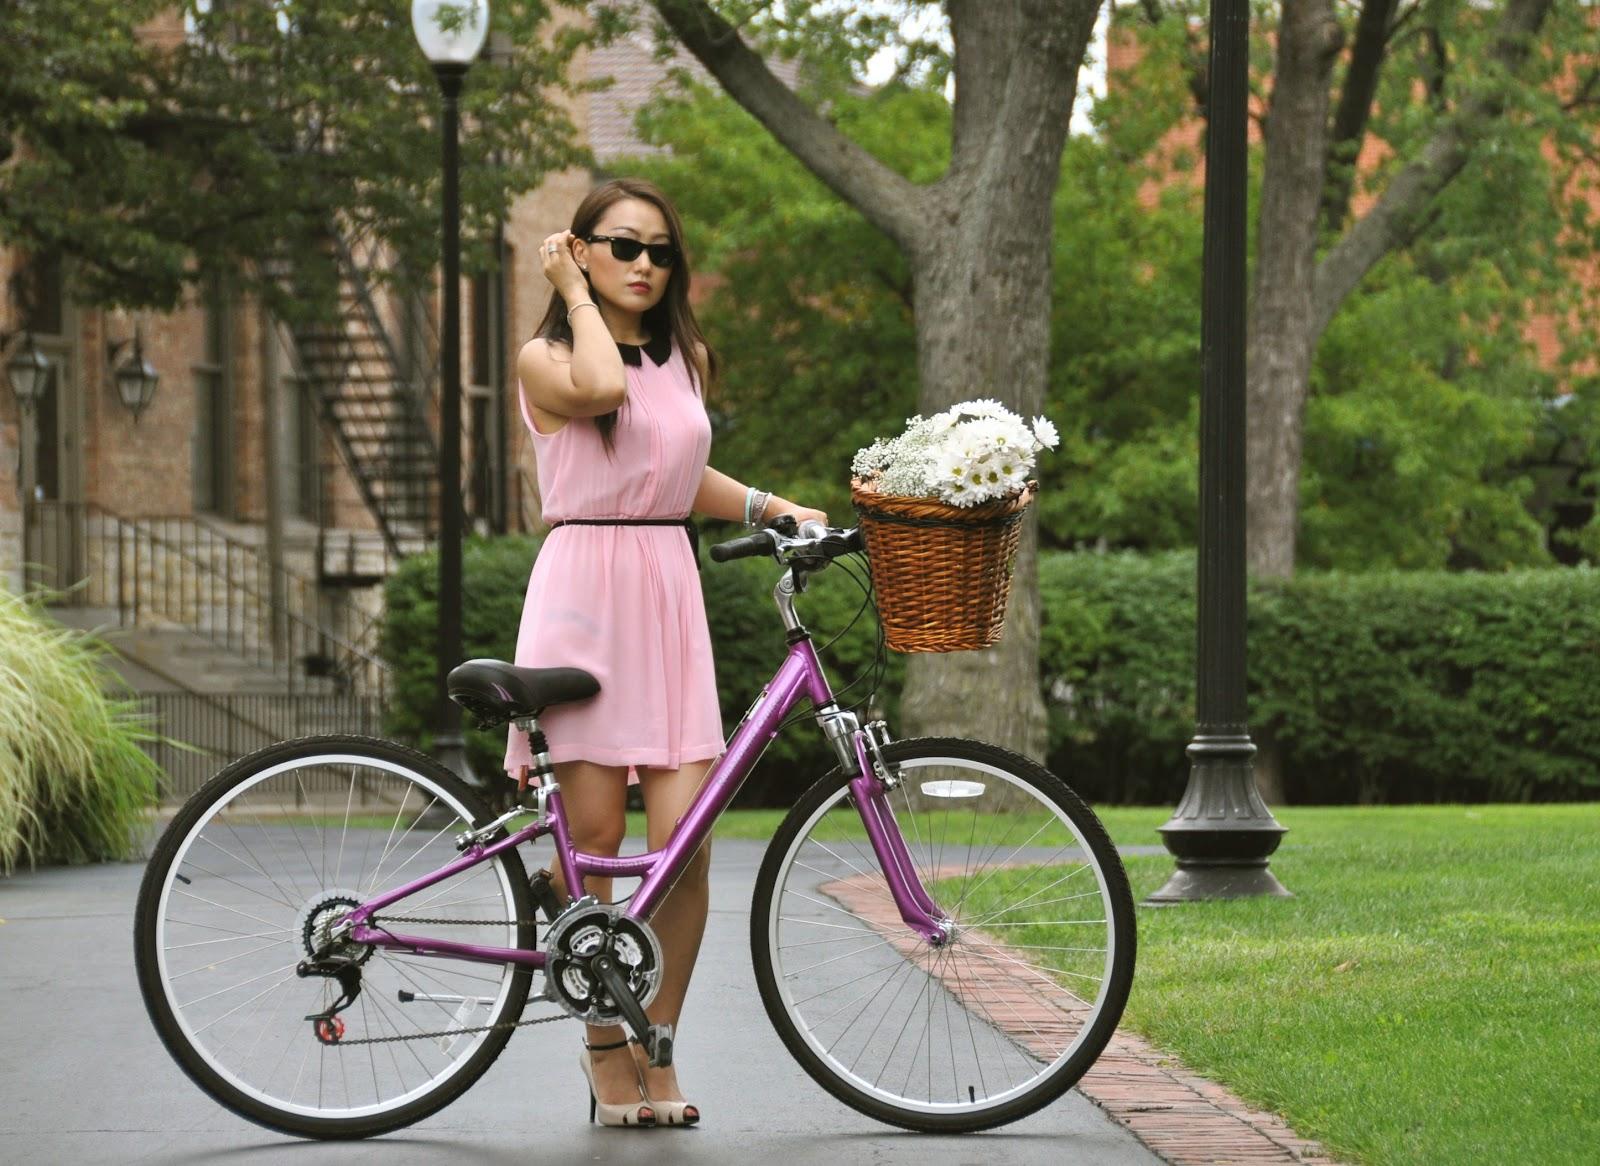 Best Cruiser Bikes For Older Women Baby Boomers